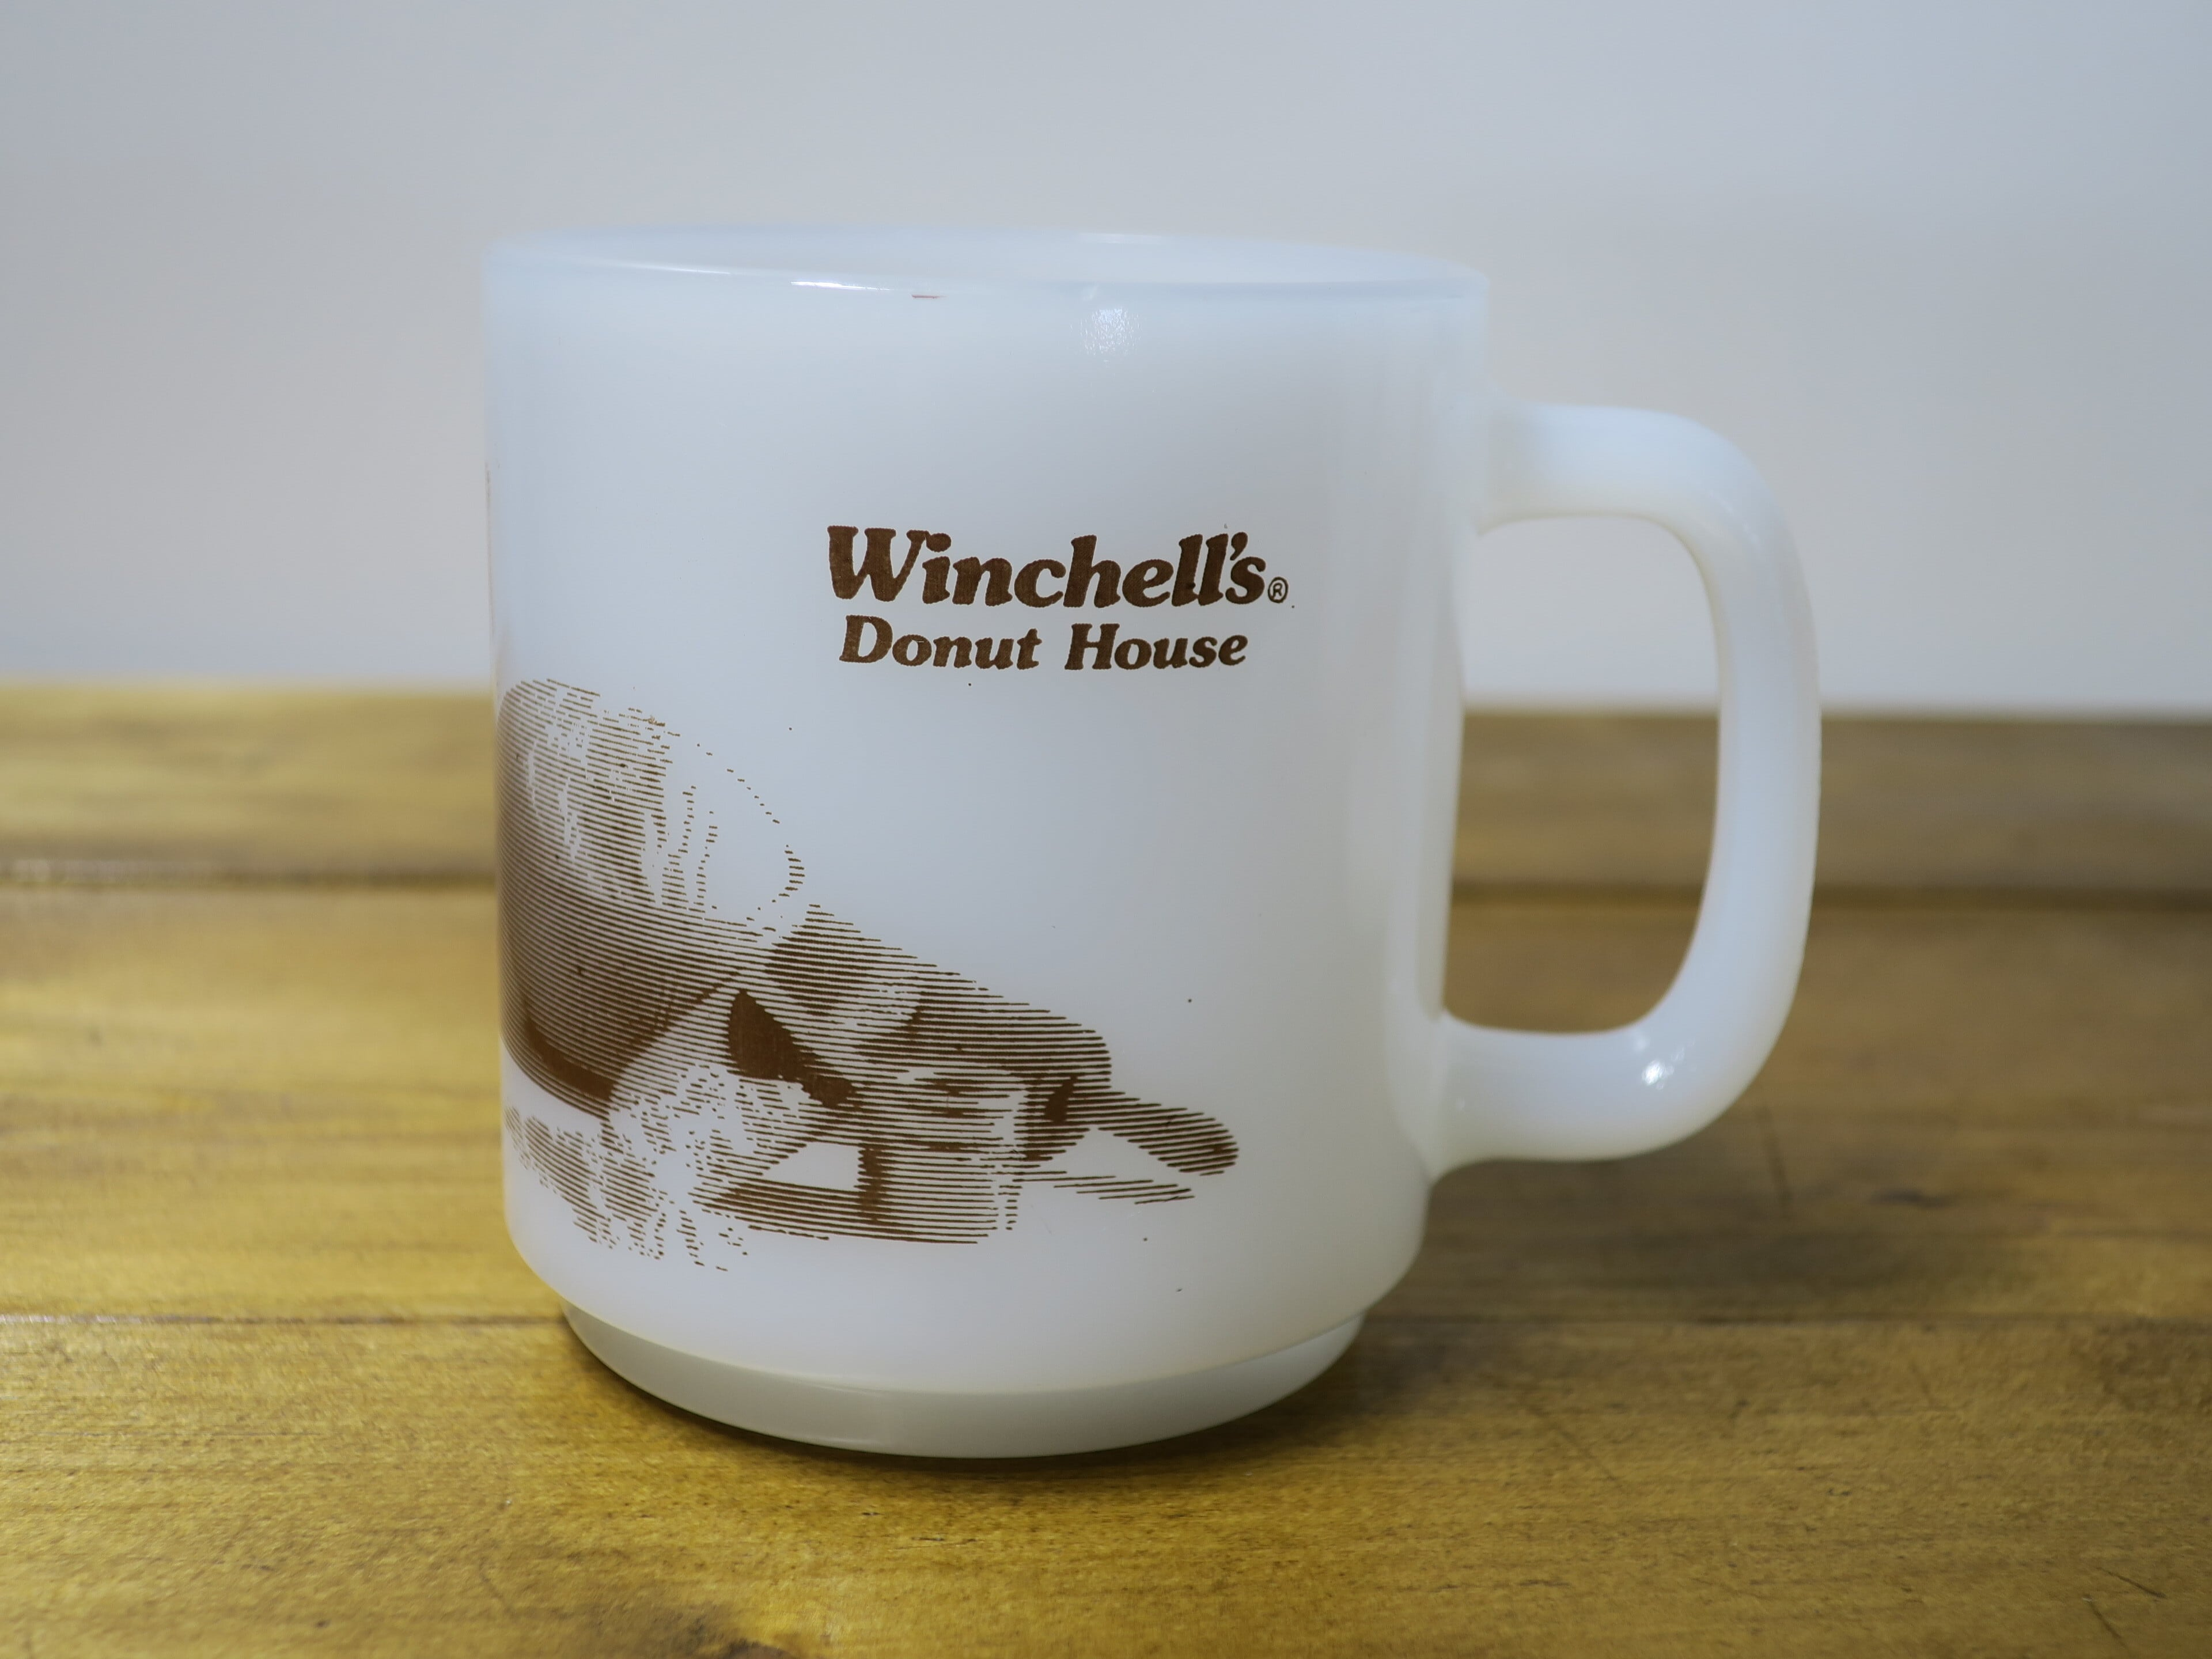 Glasbake グラスベイク スタッキング ウィンチェルズ ドーナツハウス/Winchell's